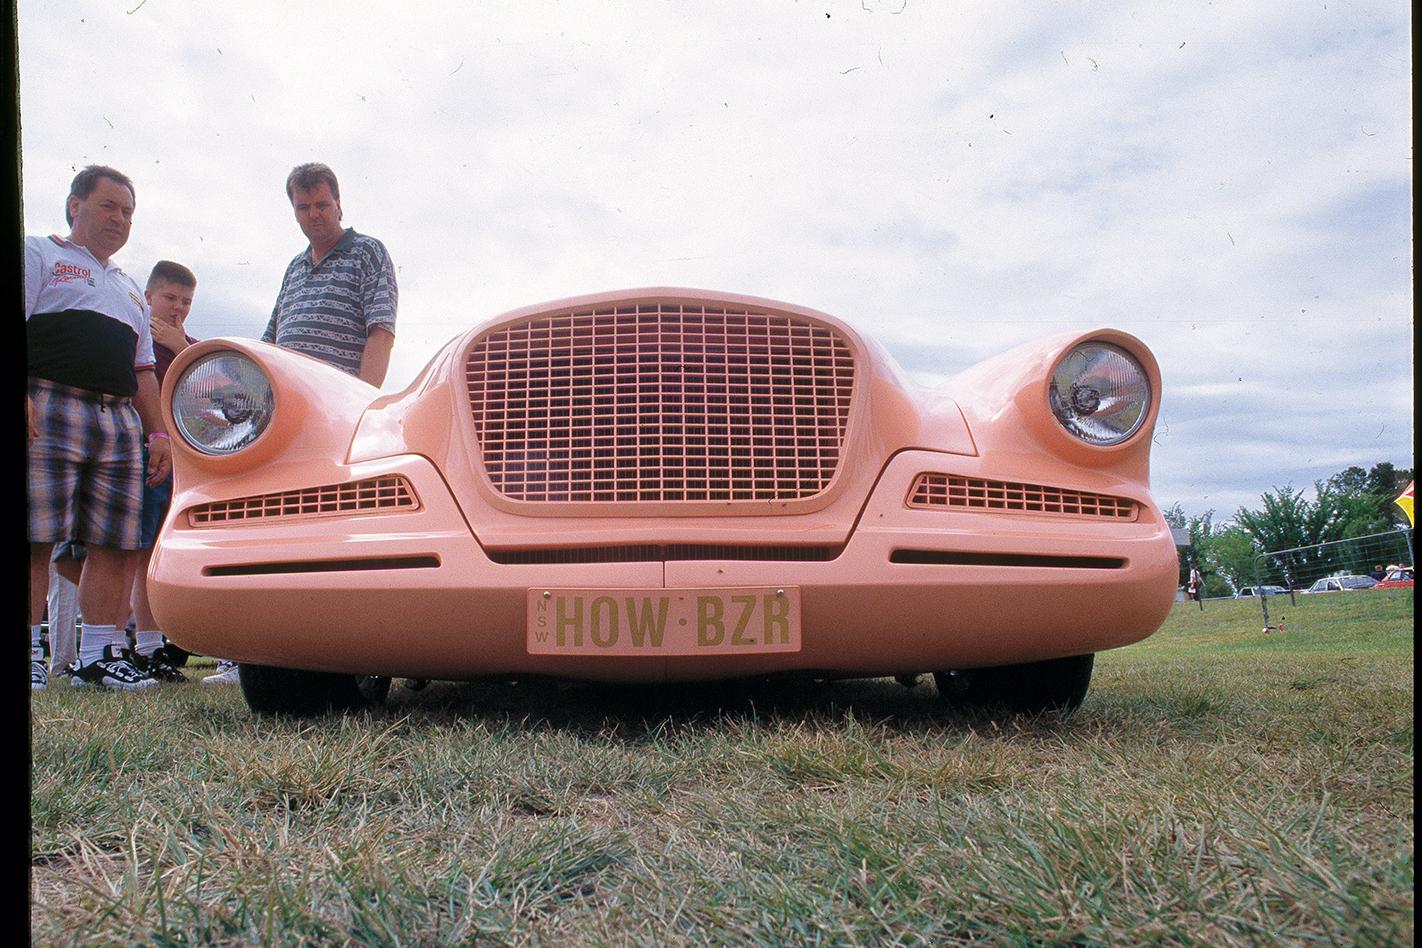 Rhonda Zelukovic's 1960 Studebaker